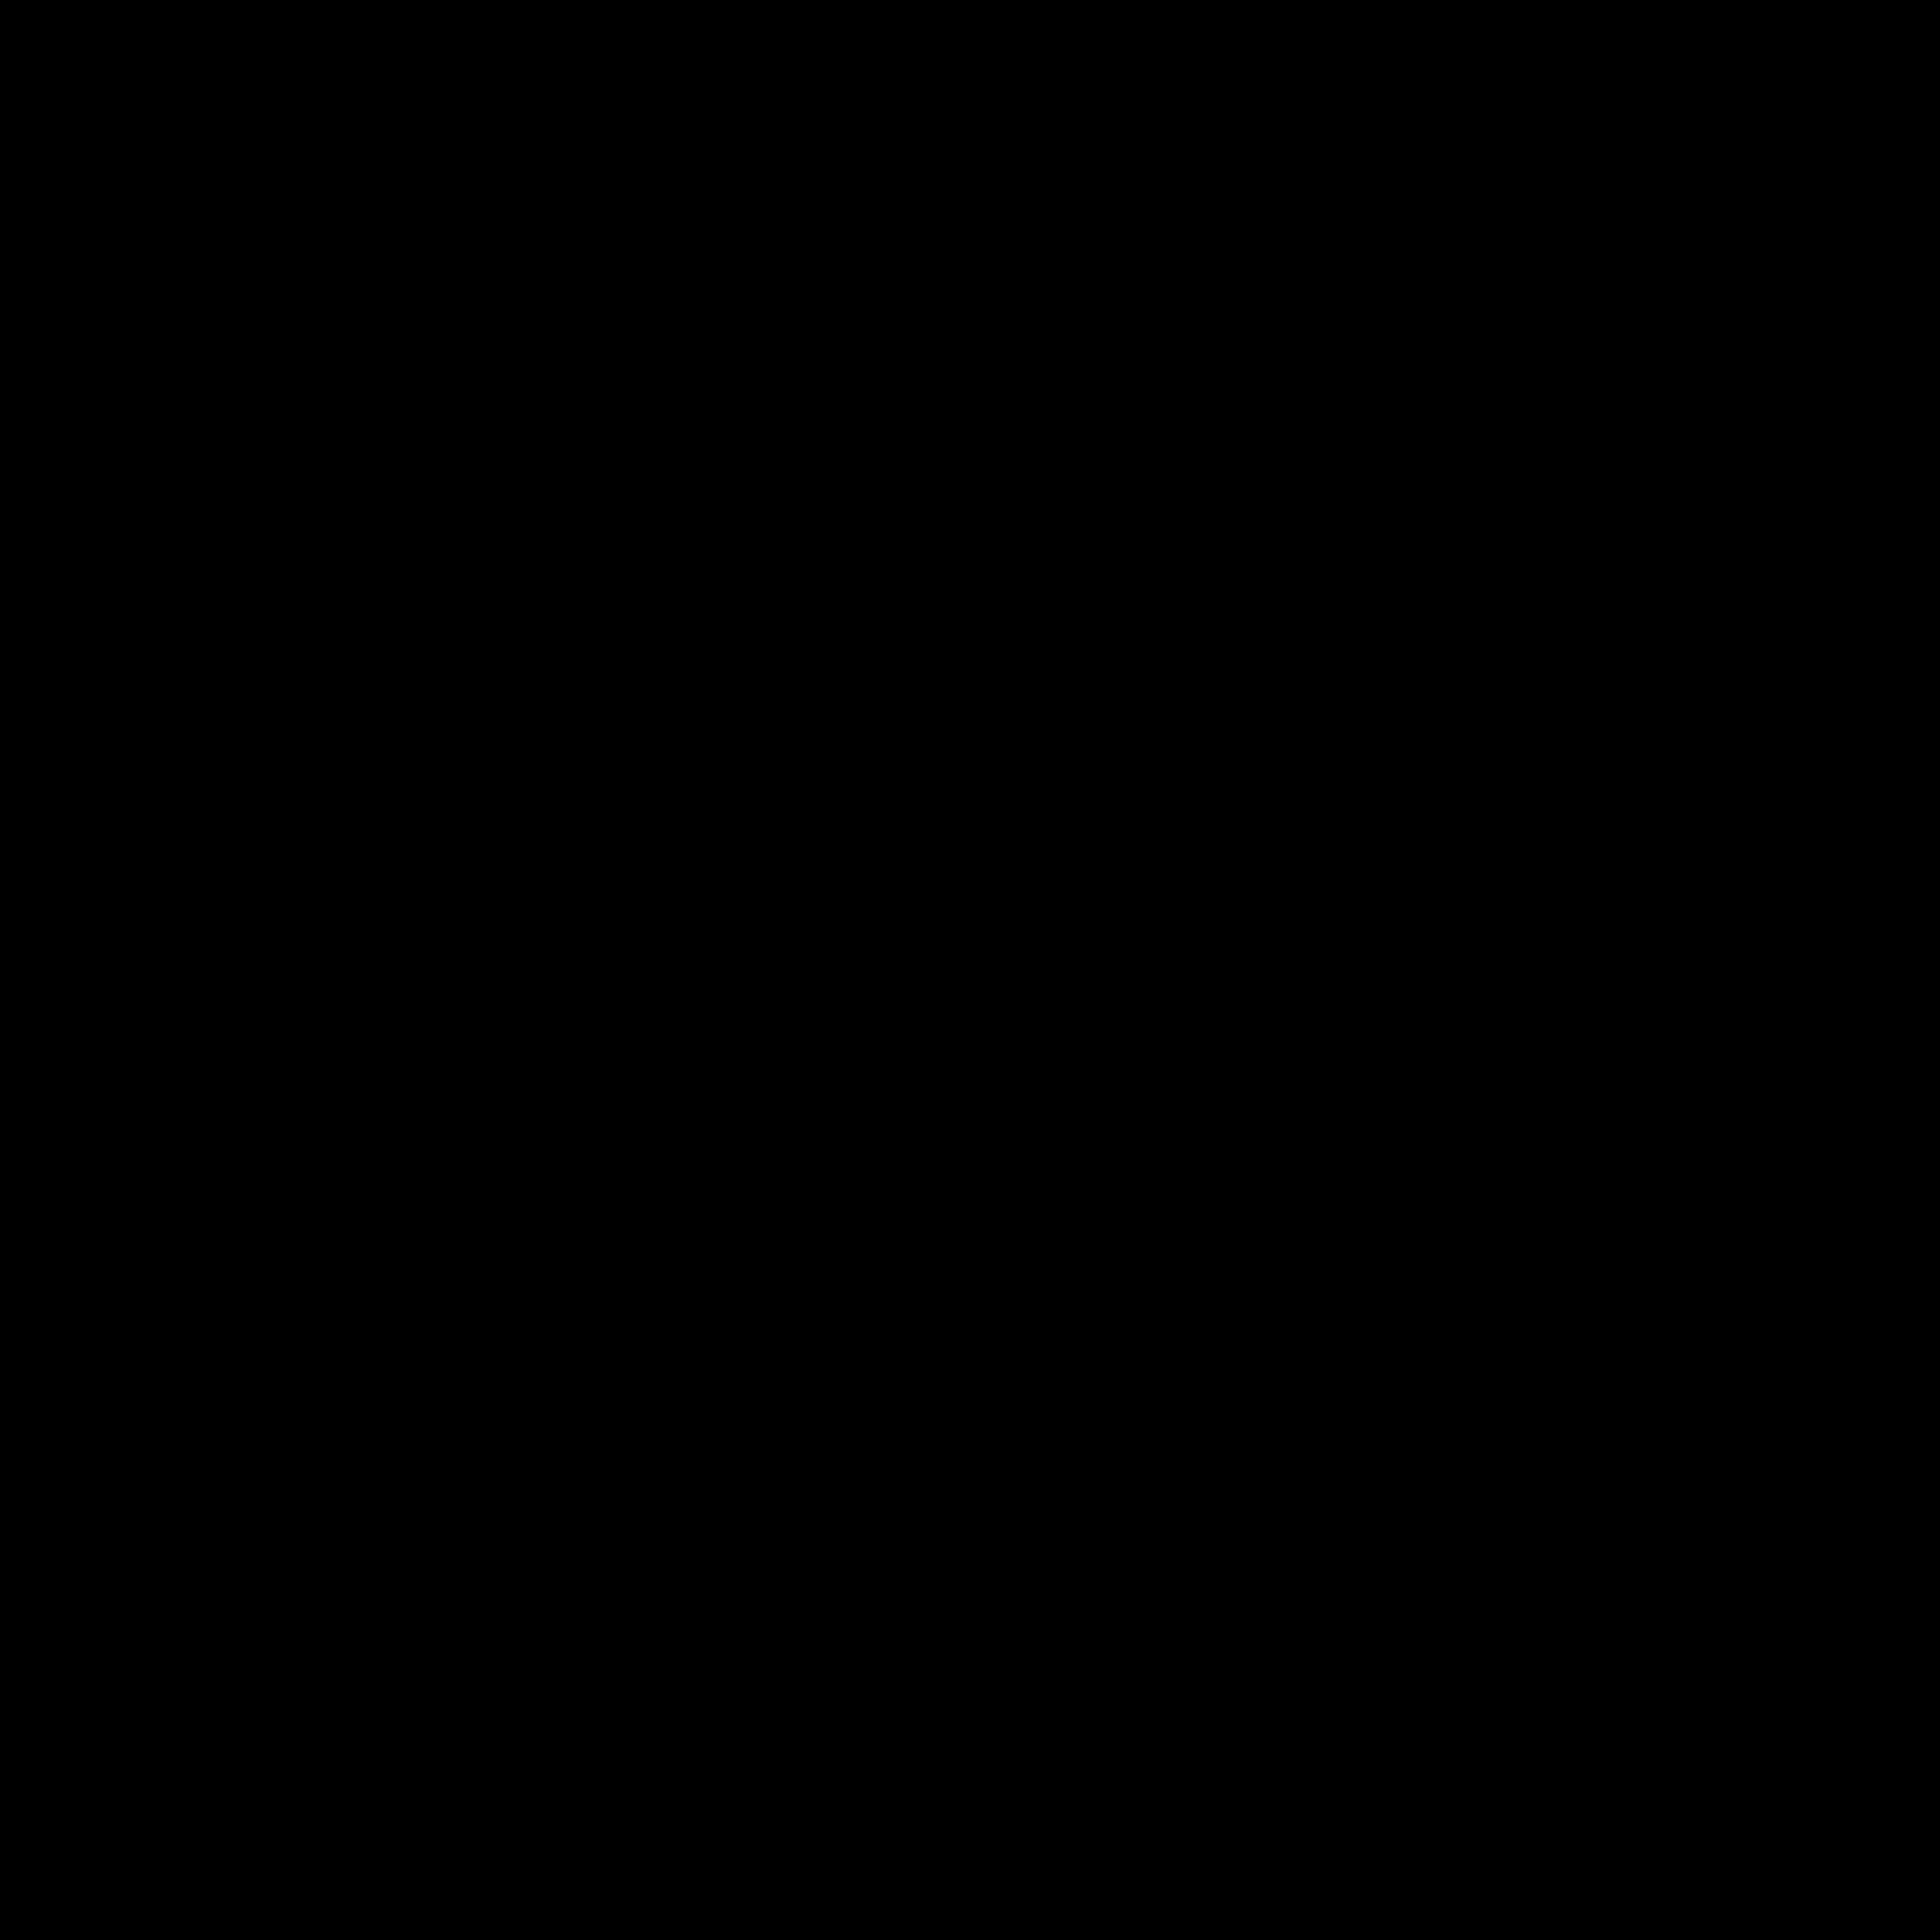 Garmin Logo PNG Transparent & SVG Vector.